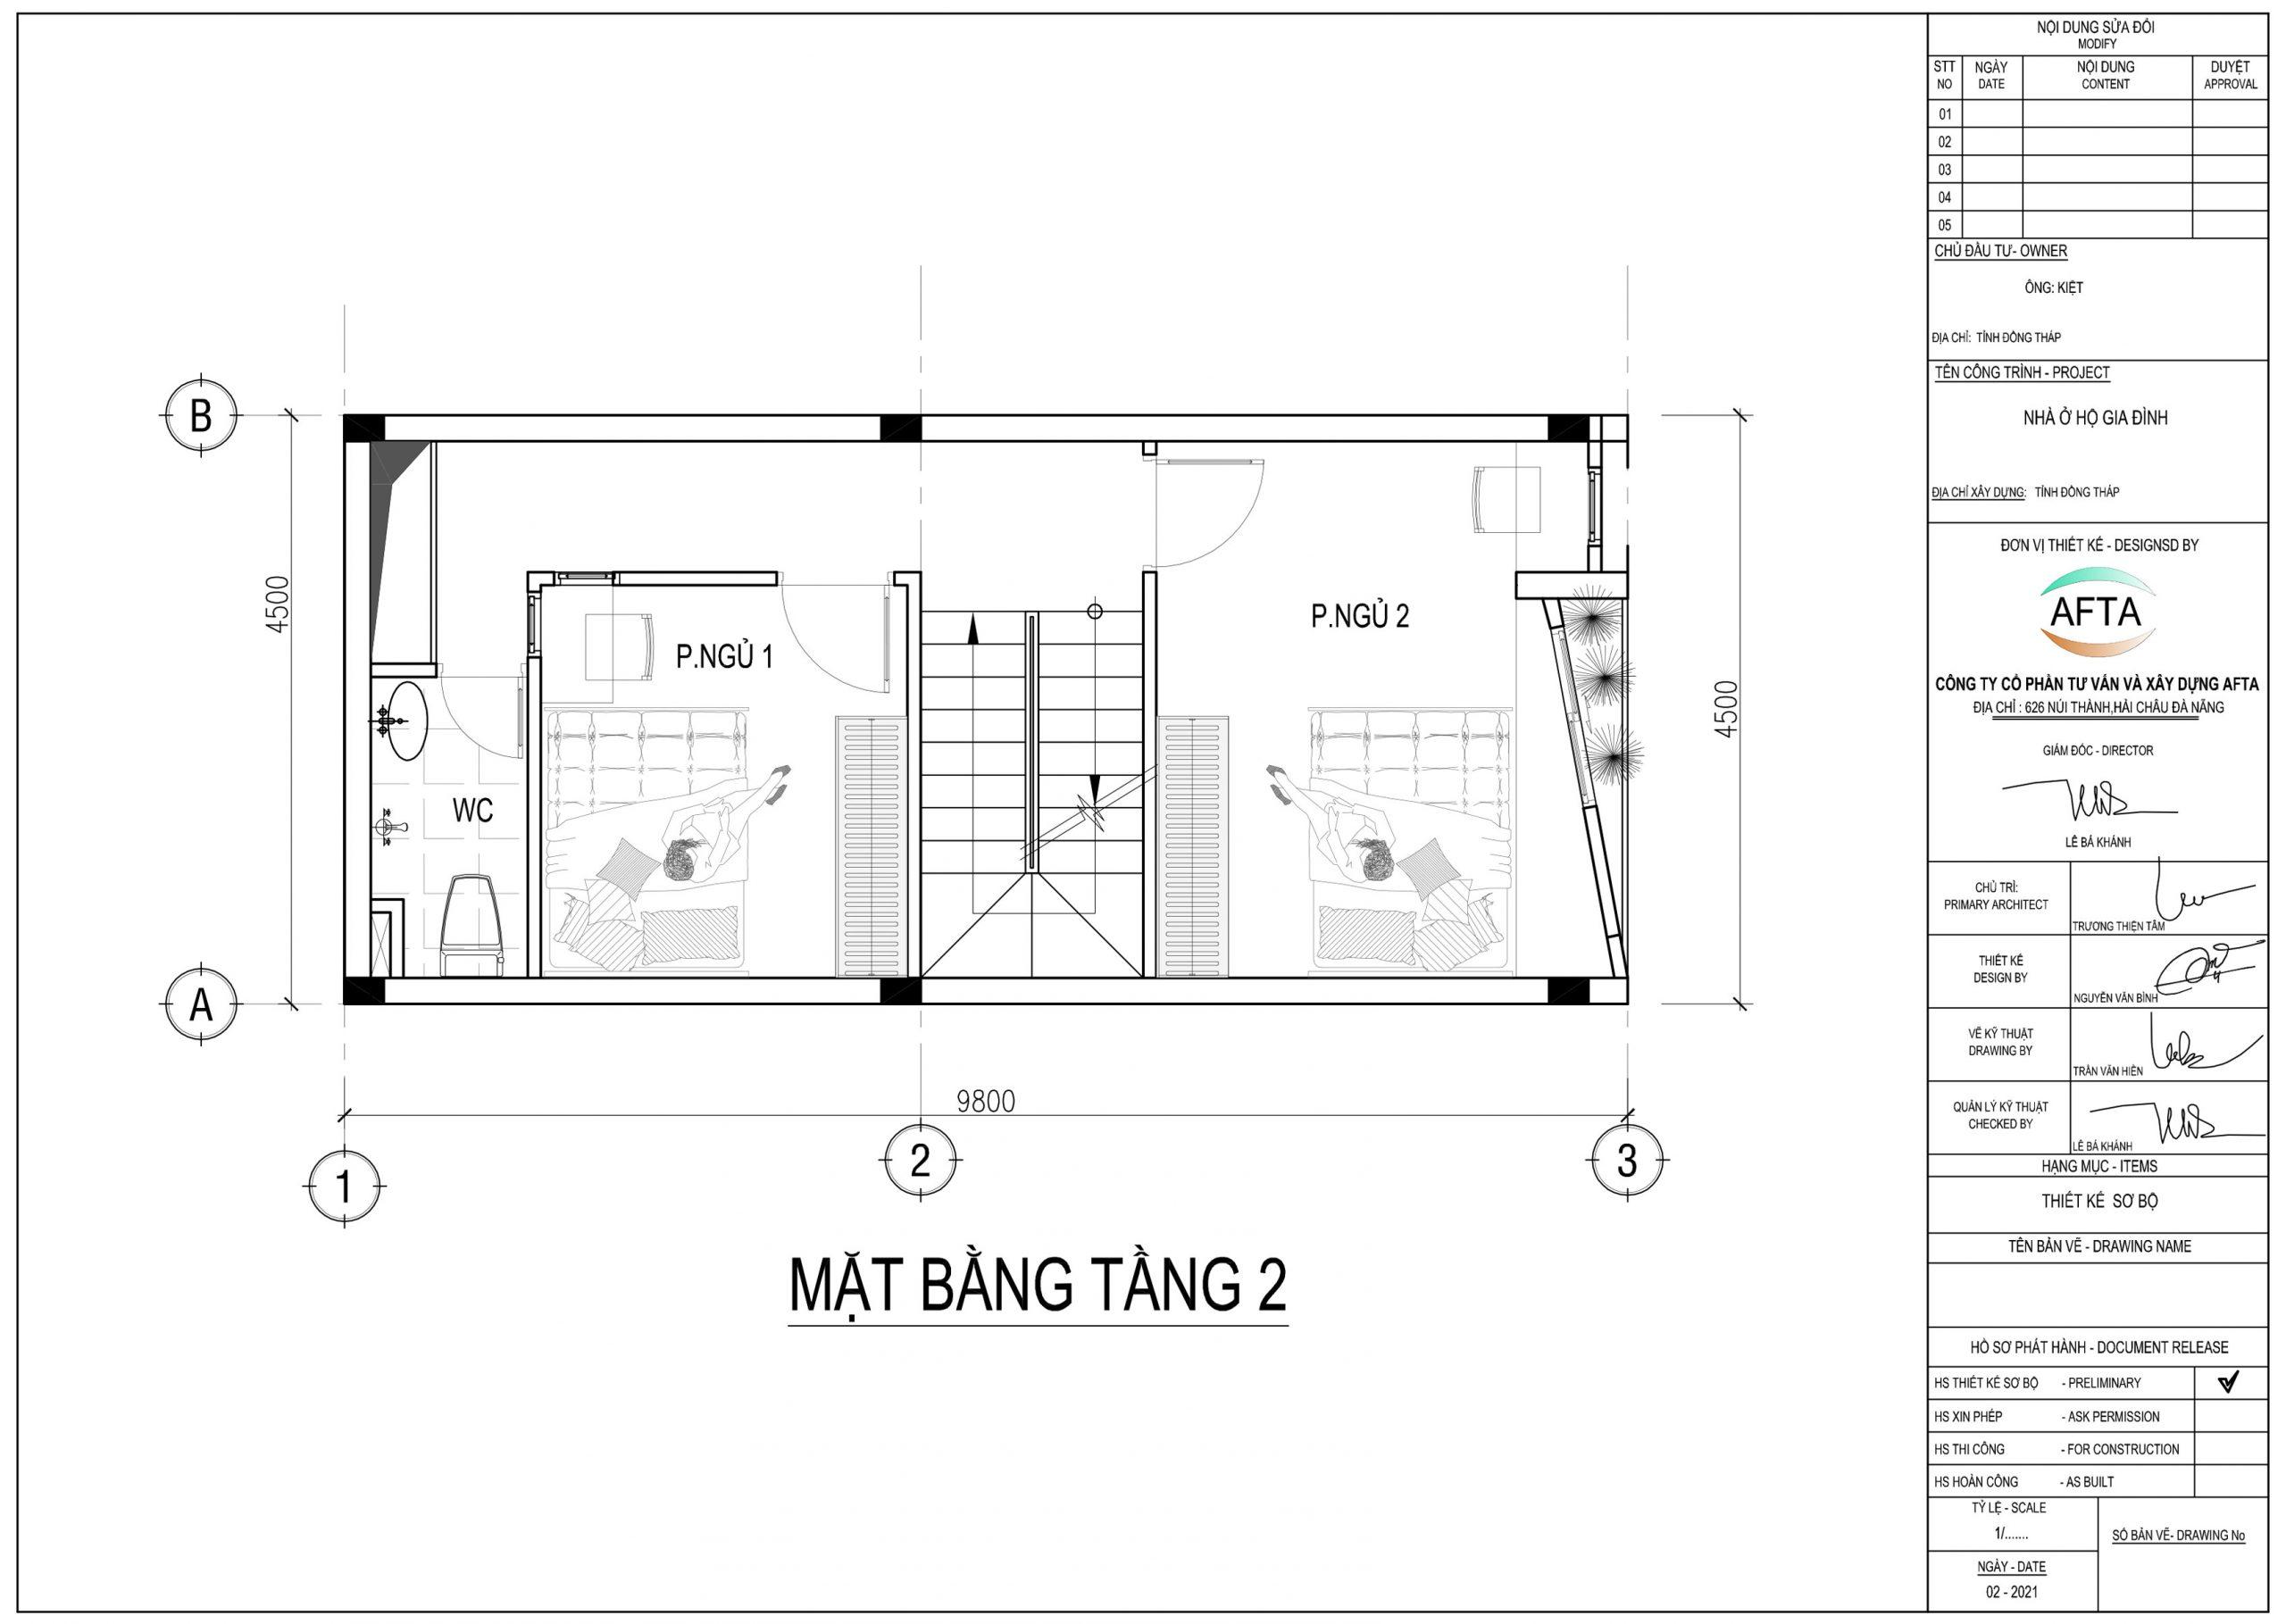 mat-bang-tang-2-nha-anh-kiet-dong-thap